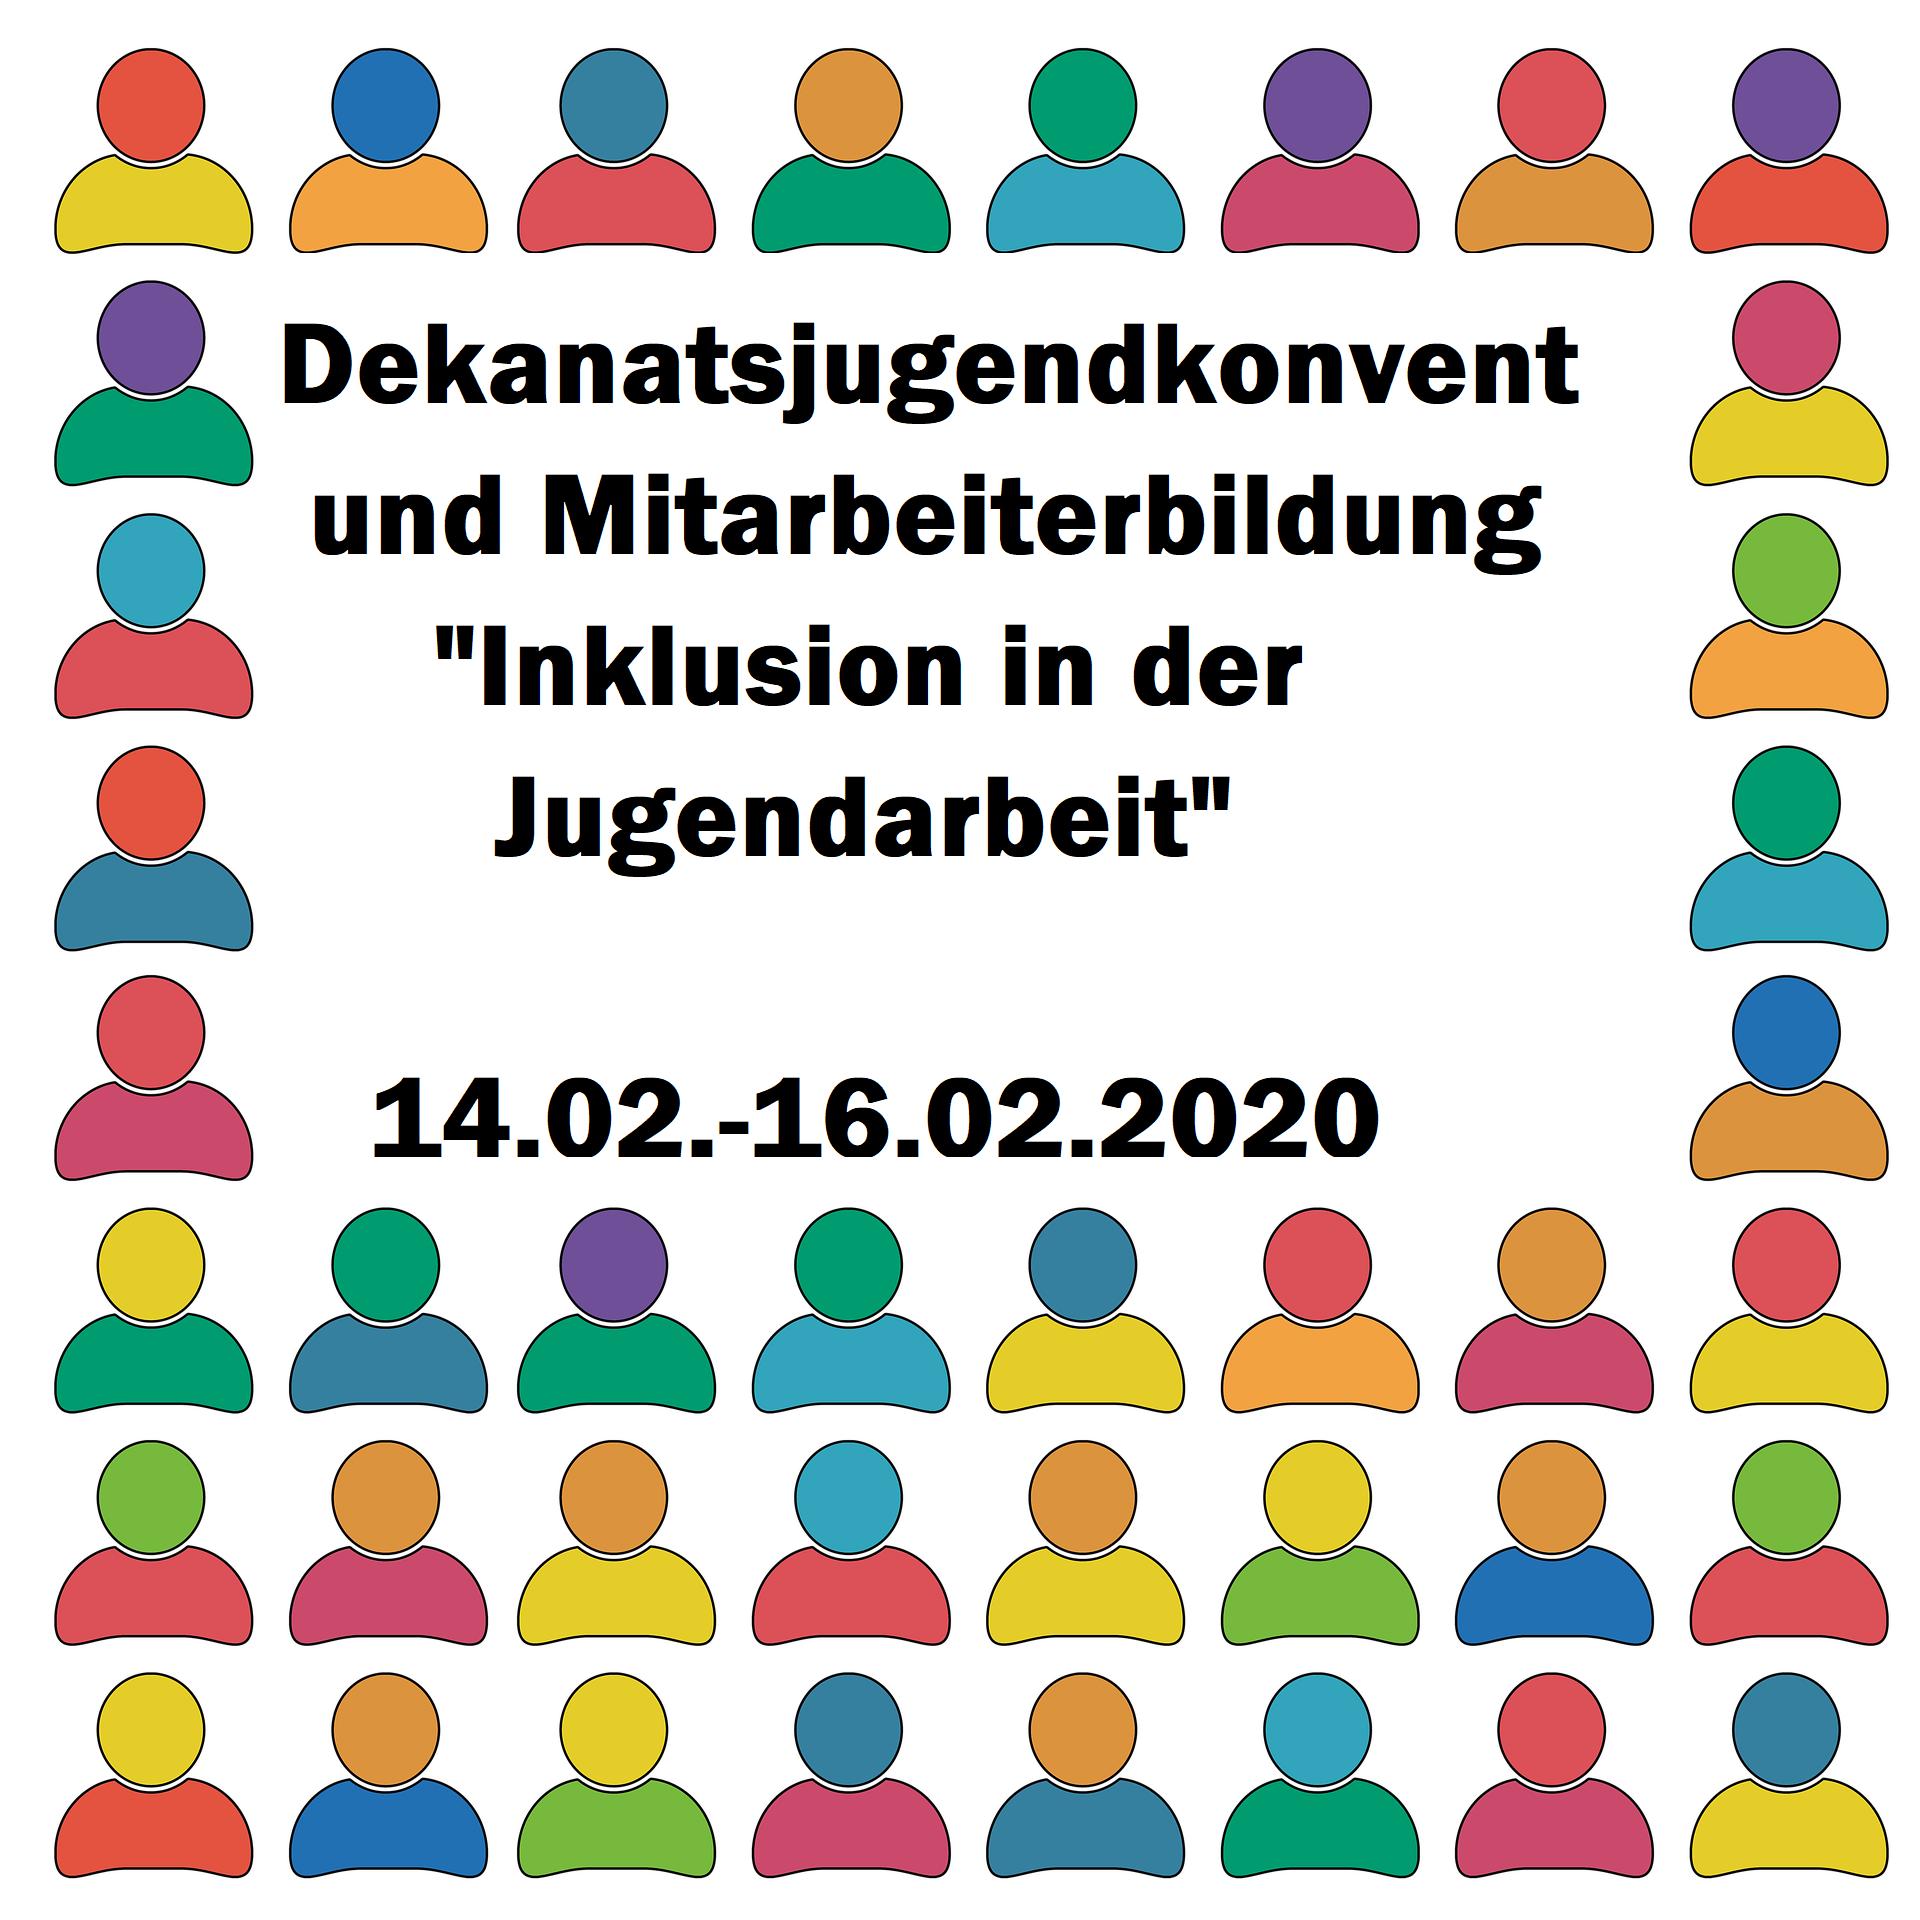 Konvent 14.-16.02.2020